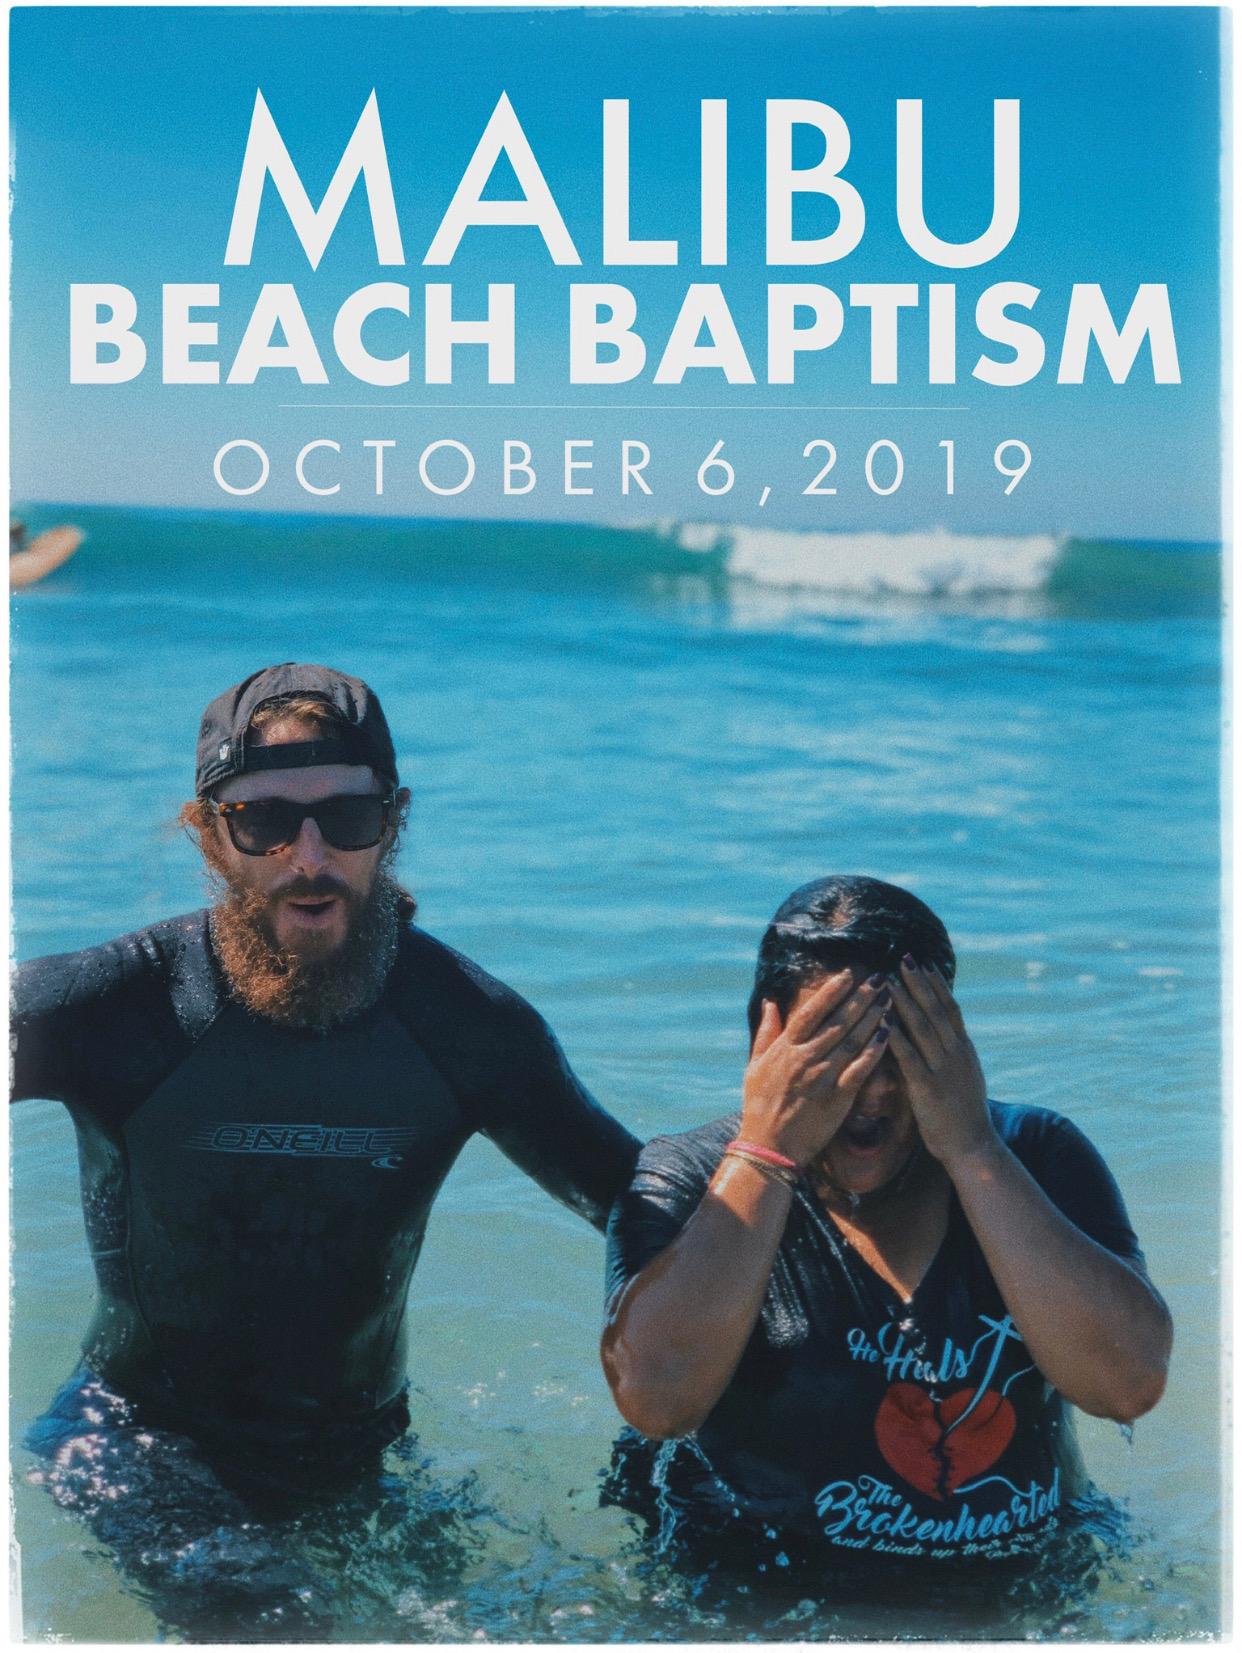 malibu-beach-baptism-2019-mission-hills-christian-church-jpeg.JPG